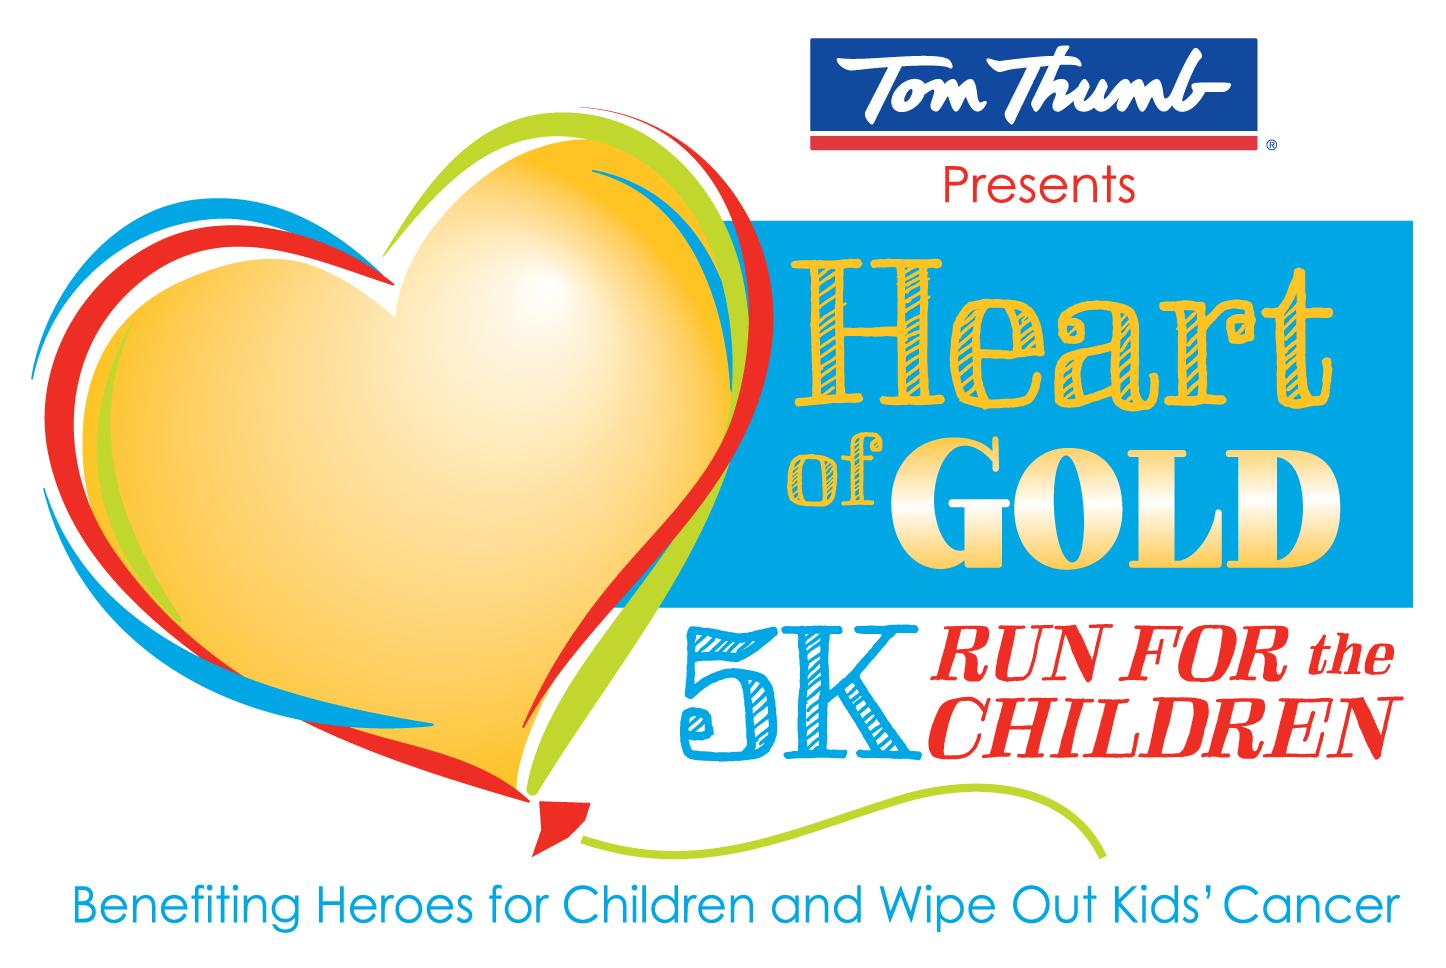 Heart Of Gold 5k Run For The Children Benefiting Heroes For Children